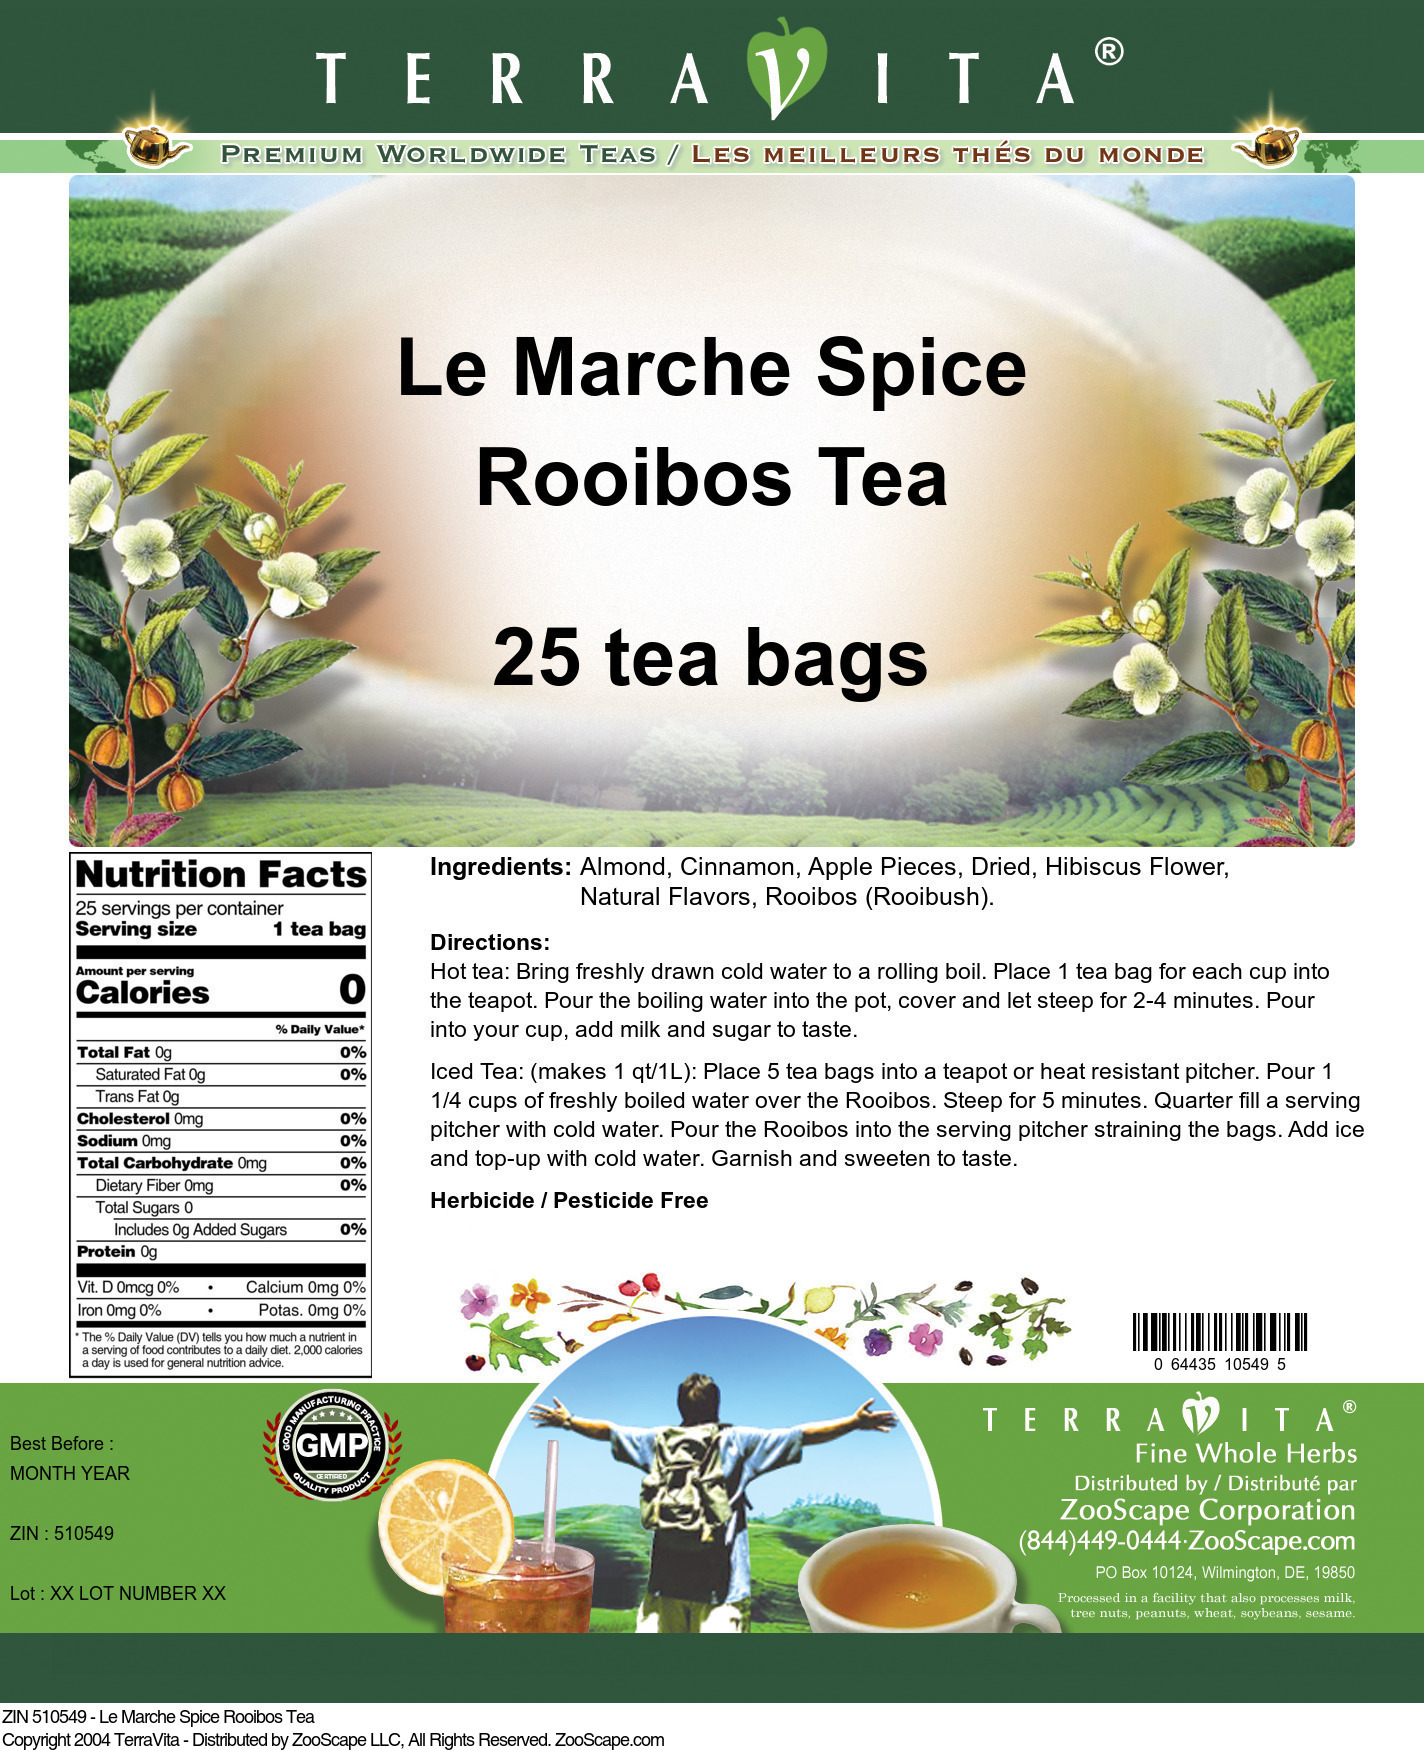 Le Marche Spice Rooibos Tea